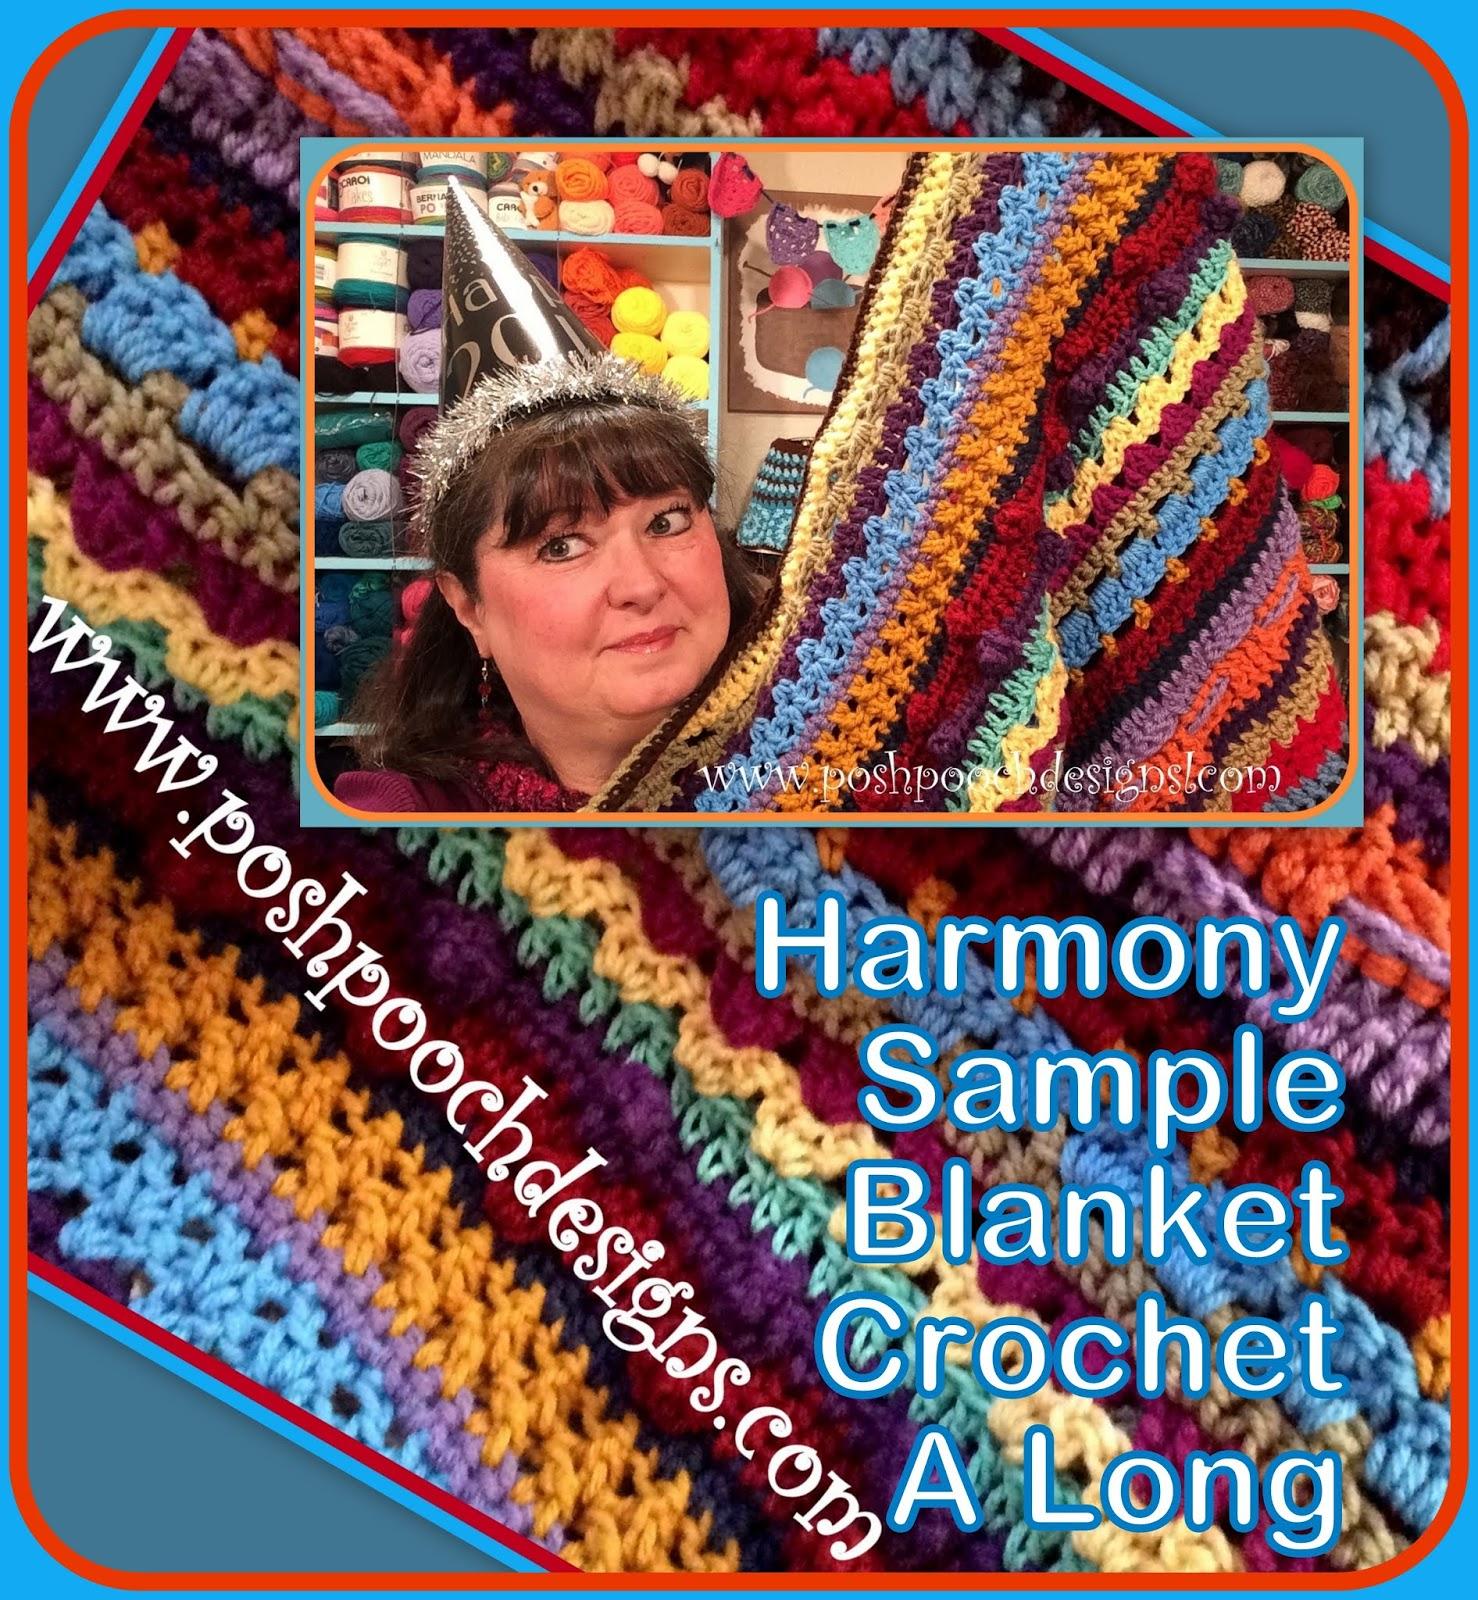 Posh Pooch Designs Dog Clothes: Harmony Sample Blanket